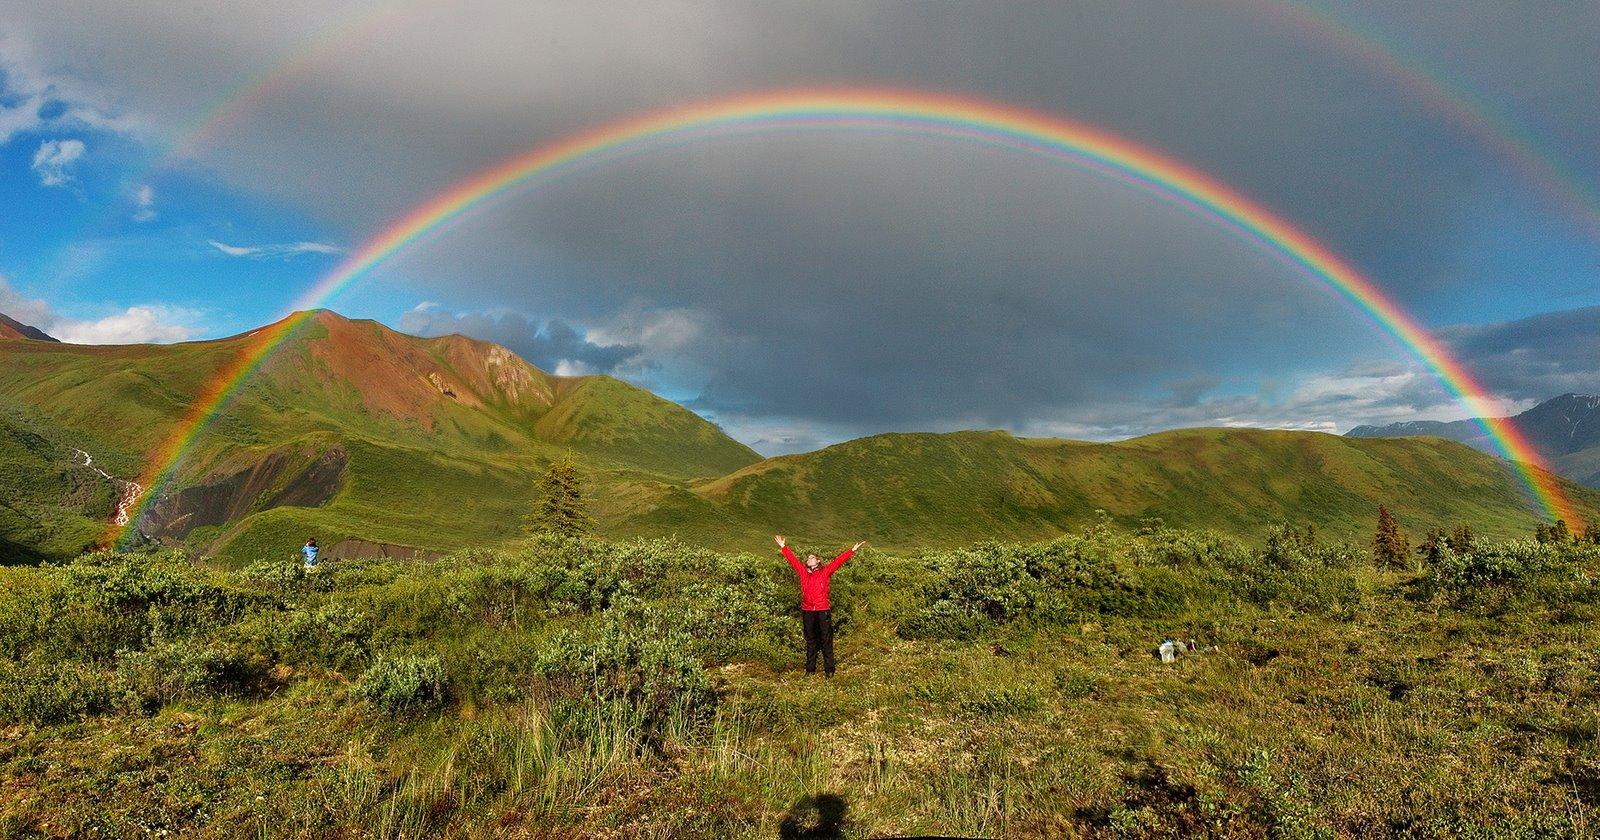 ati radeon 2100 rainbow six vegas